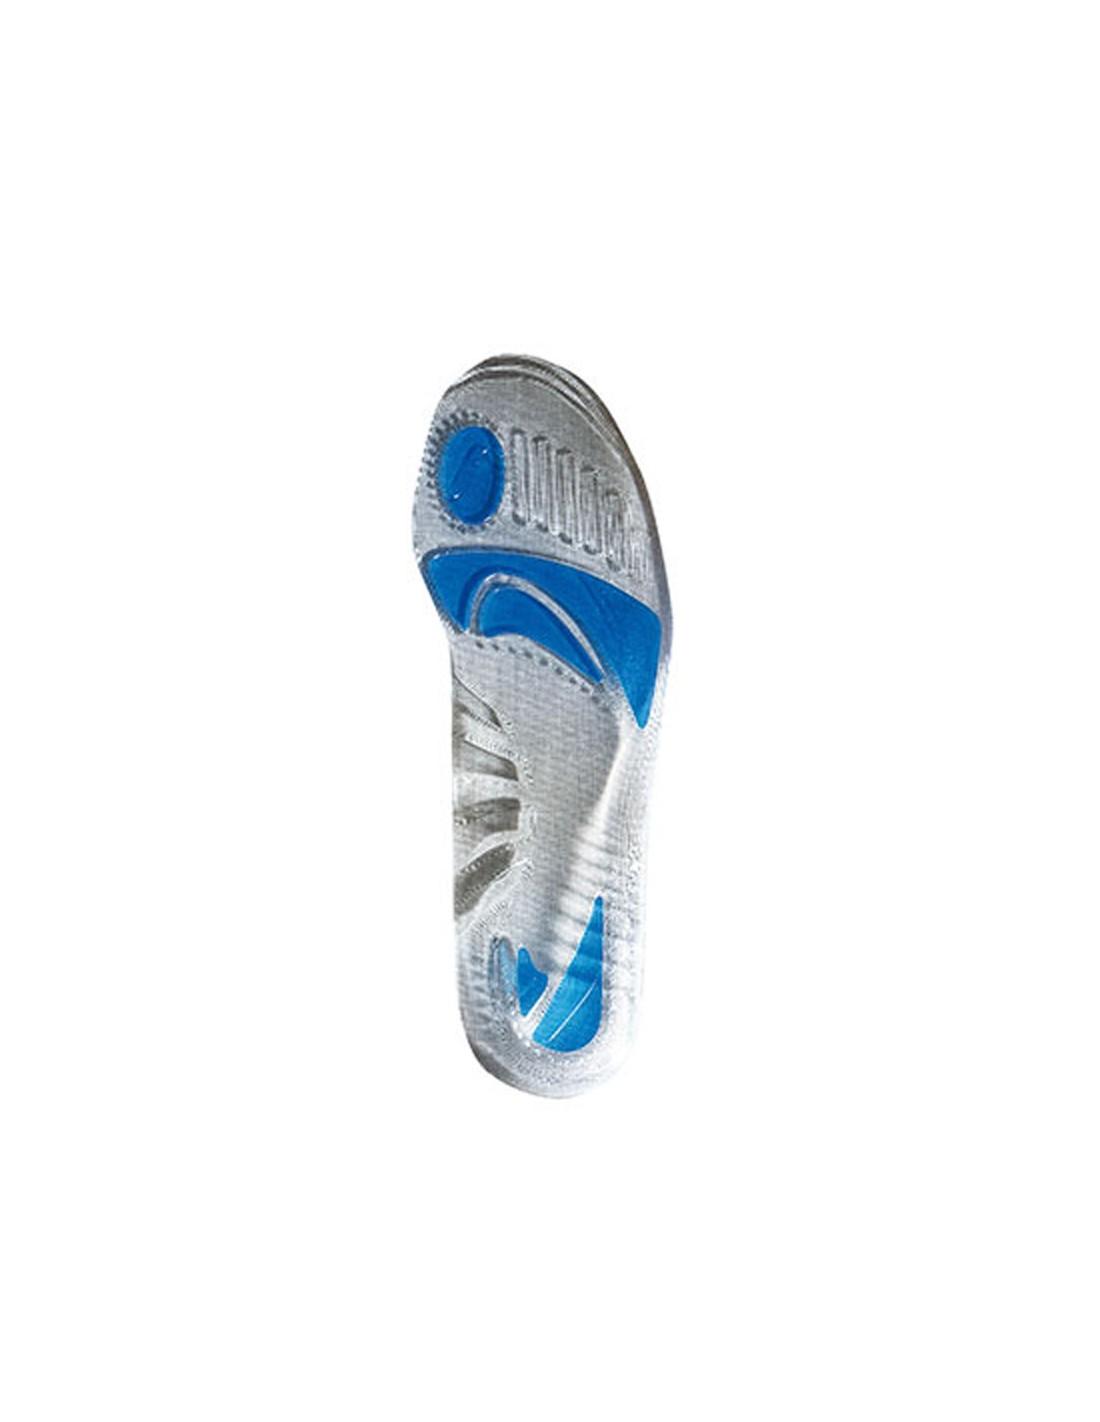 Zapato Vesta S2 MTS